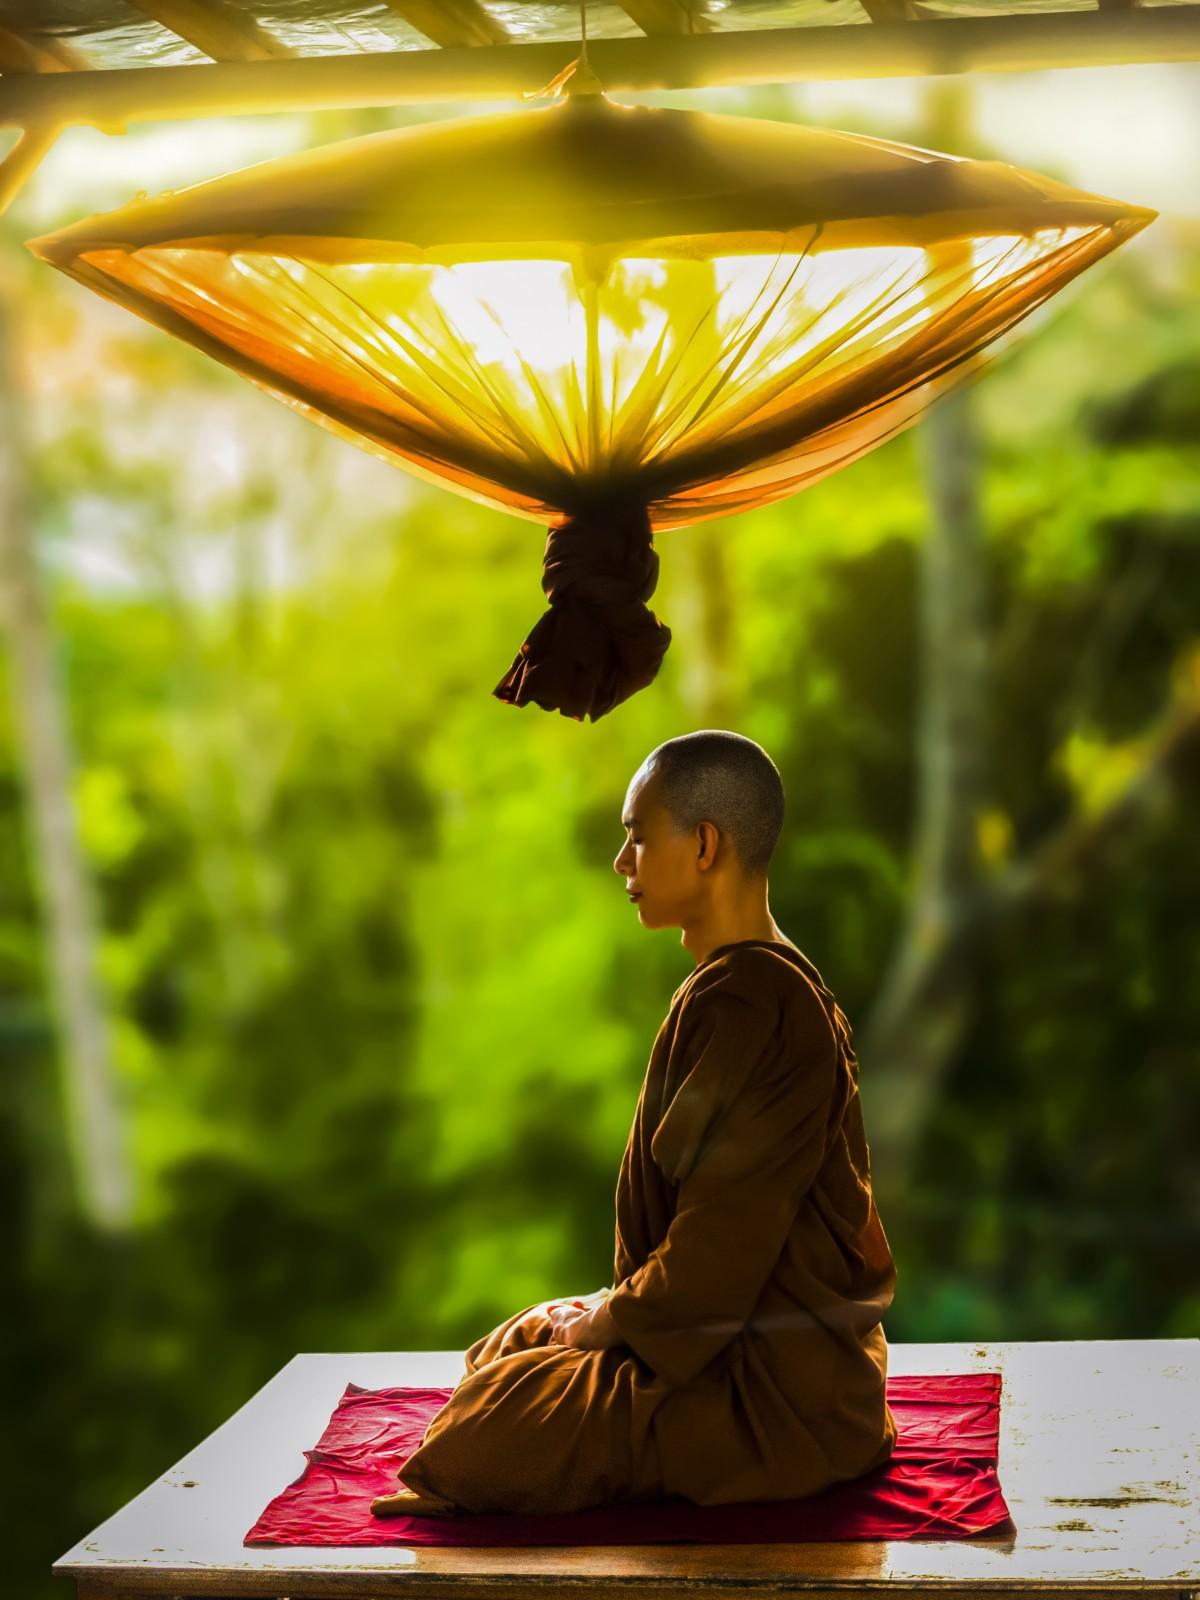 Asian meditation images, sexplate porno